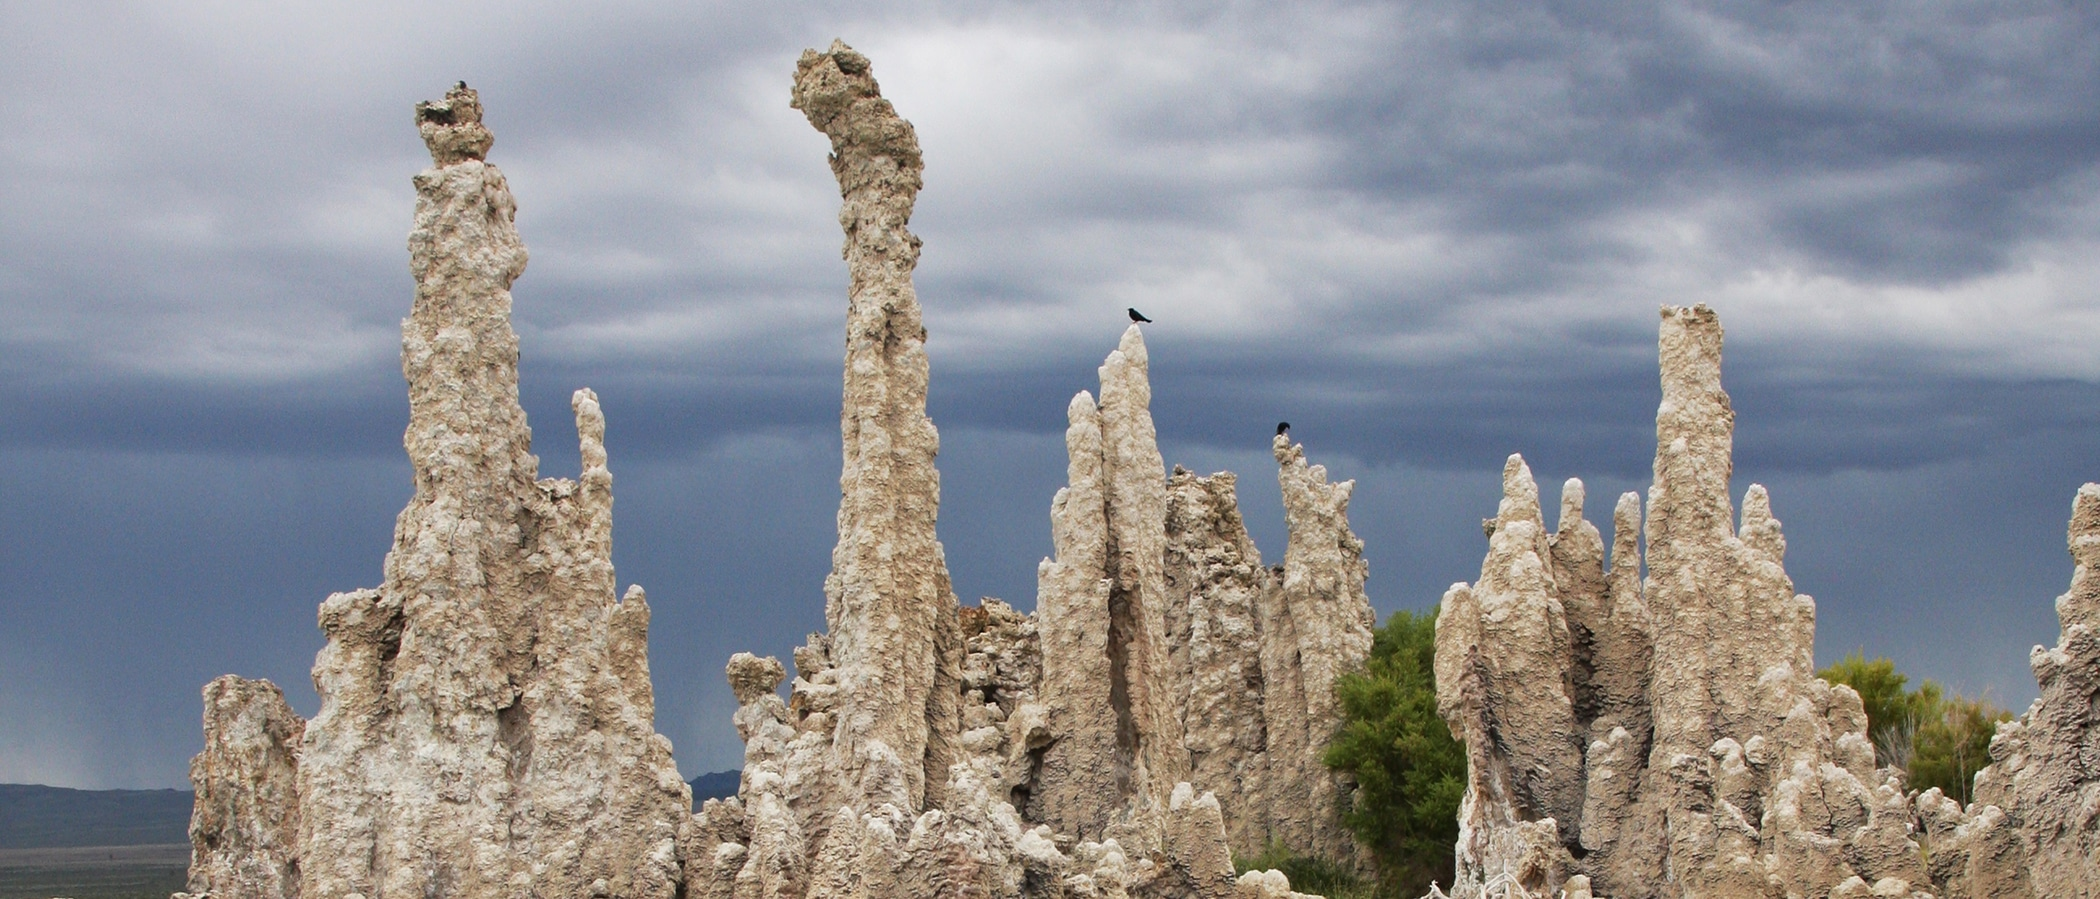 Tall, thin tufa towers reach into the gray-blue sky above.